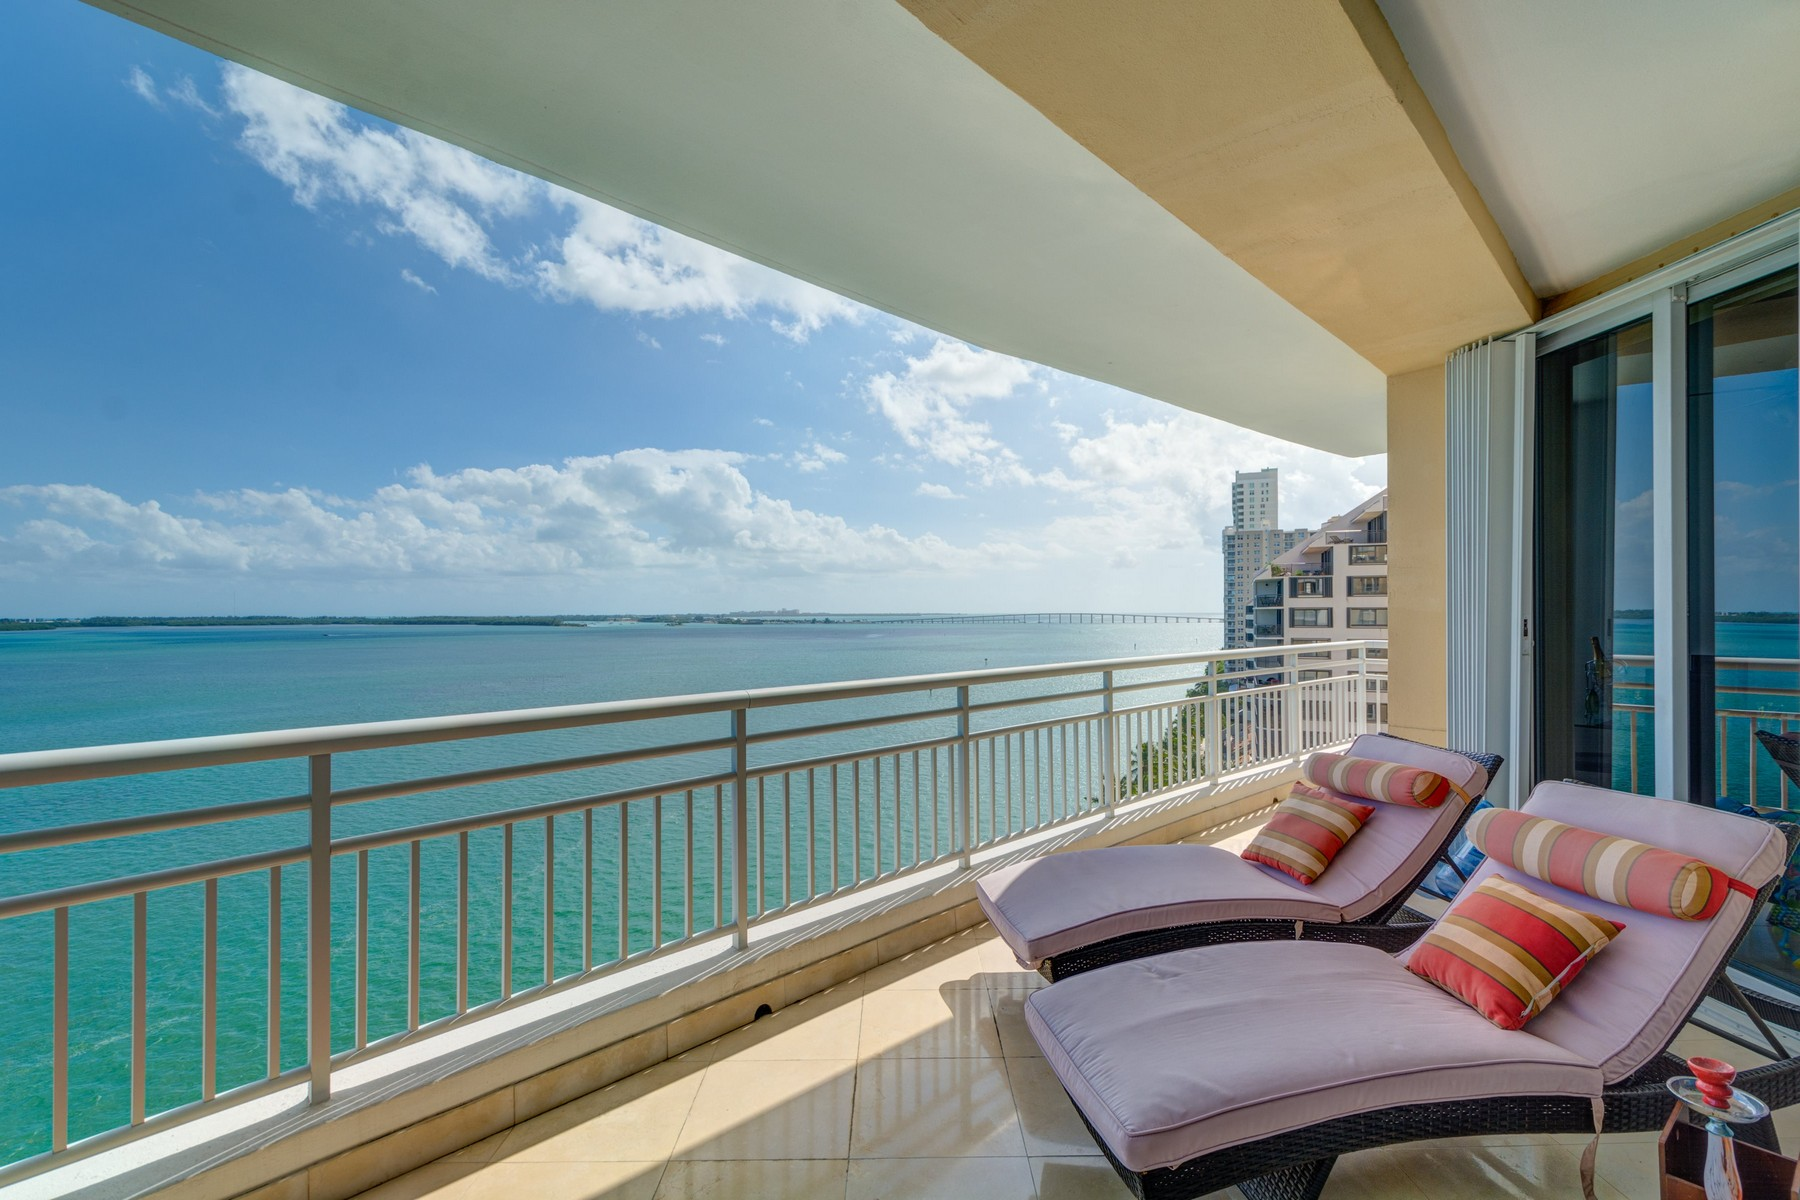 Condominium for Sale at 808 Brickell Key Dr #1104 808 Brickell Key Drive 1104 Miami, Florida, 33131 United States